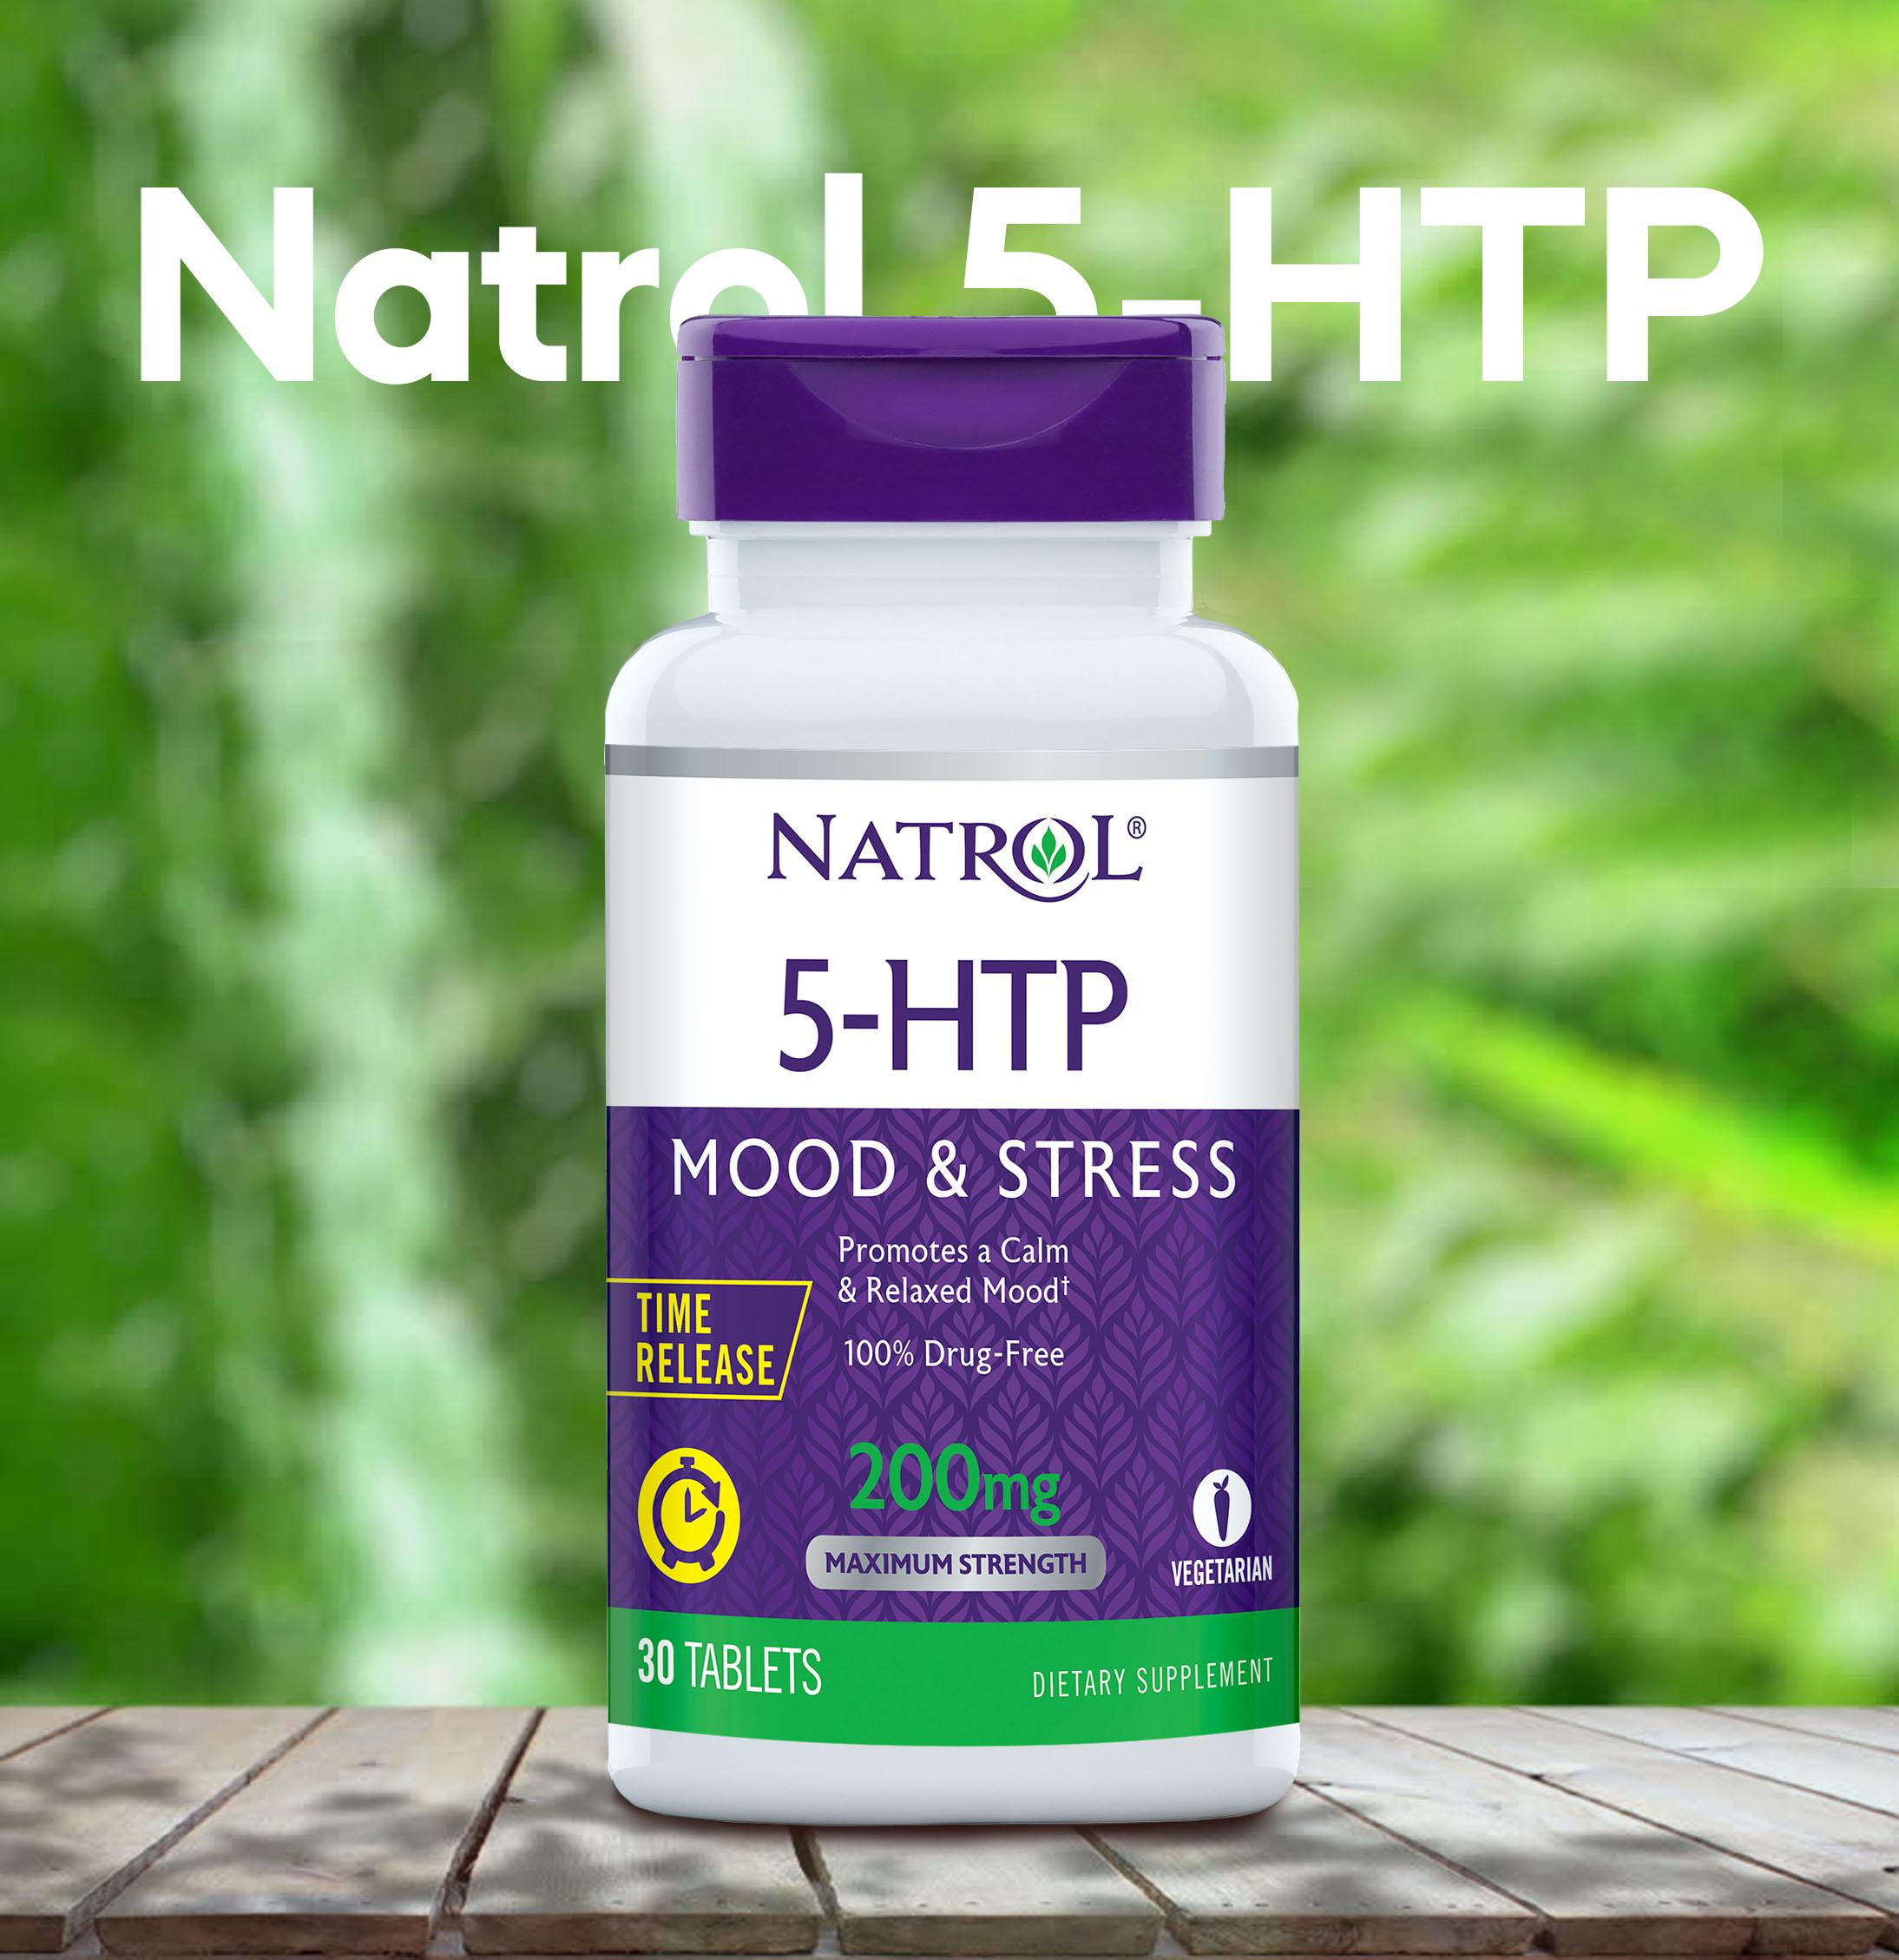 Natrol 5 HTP